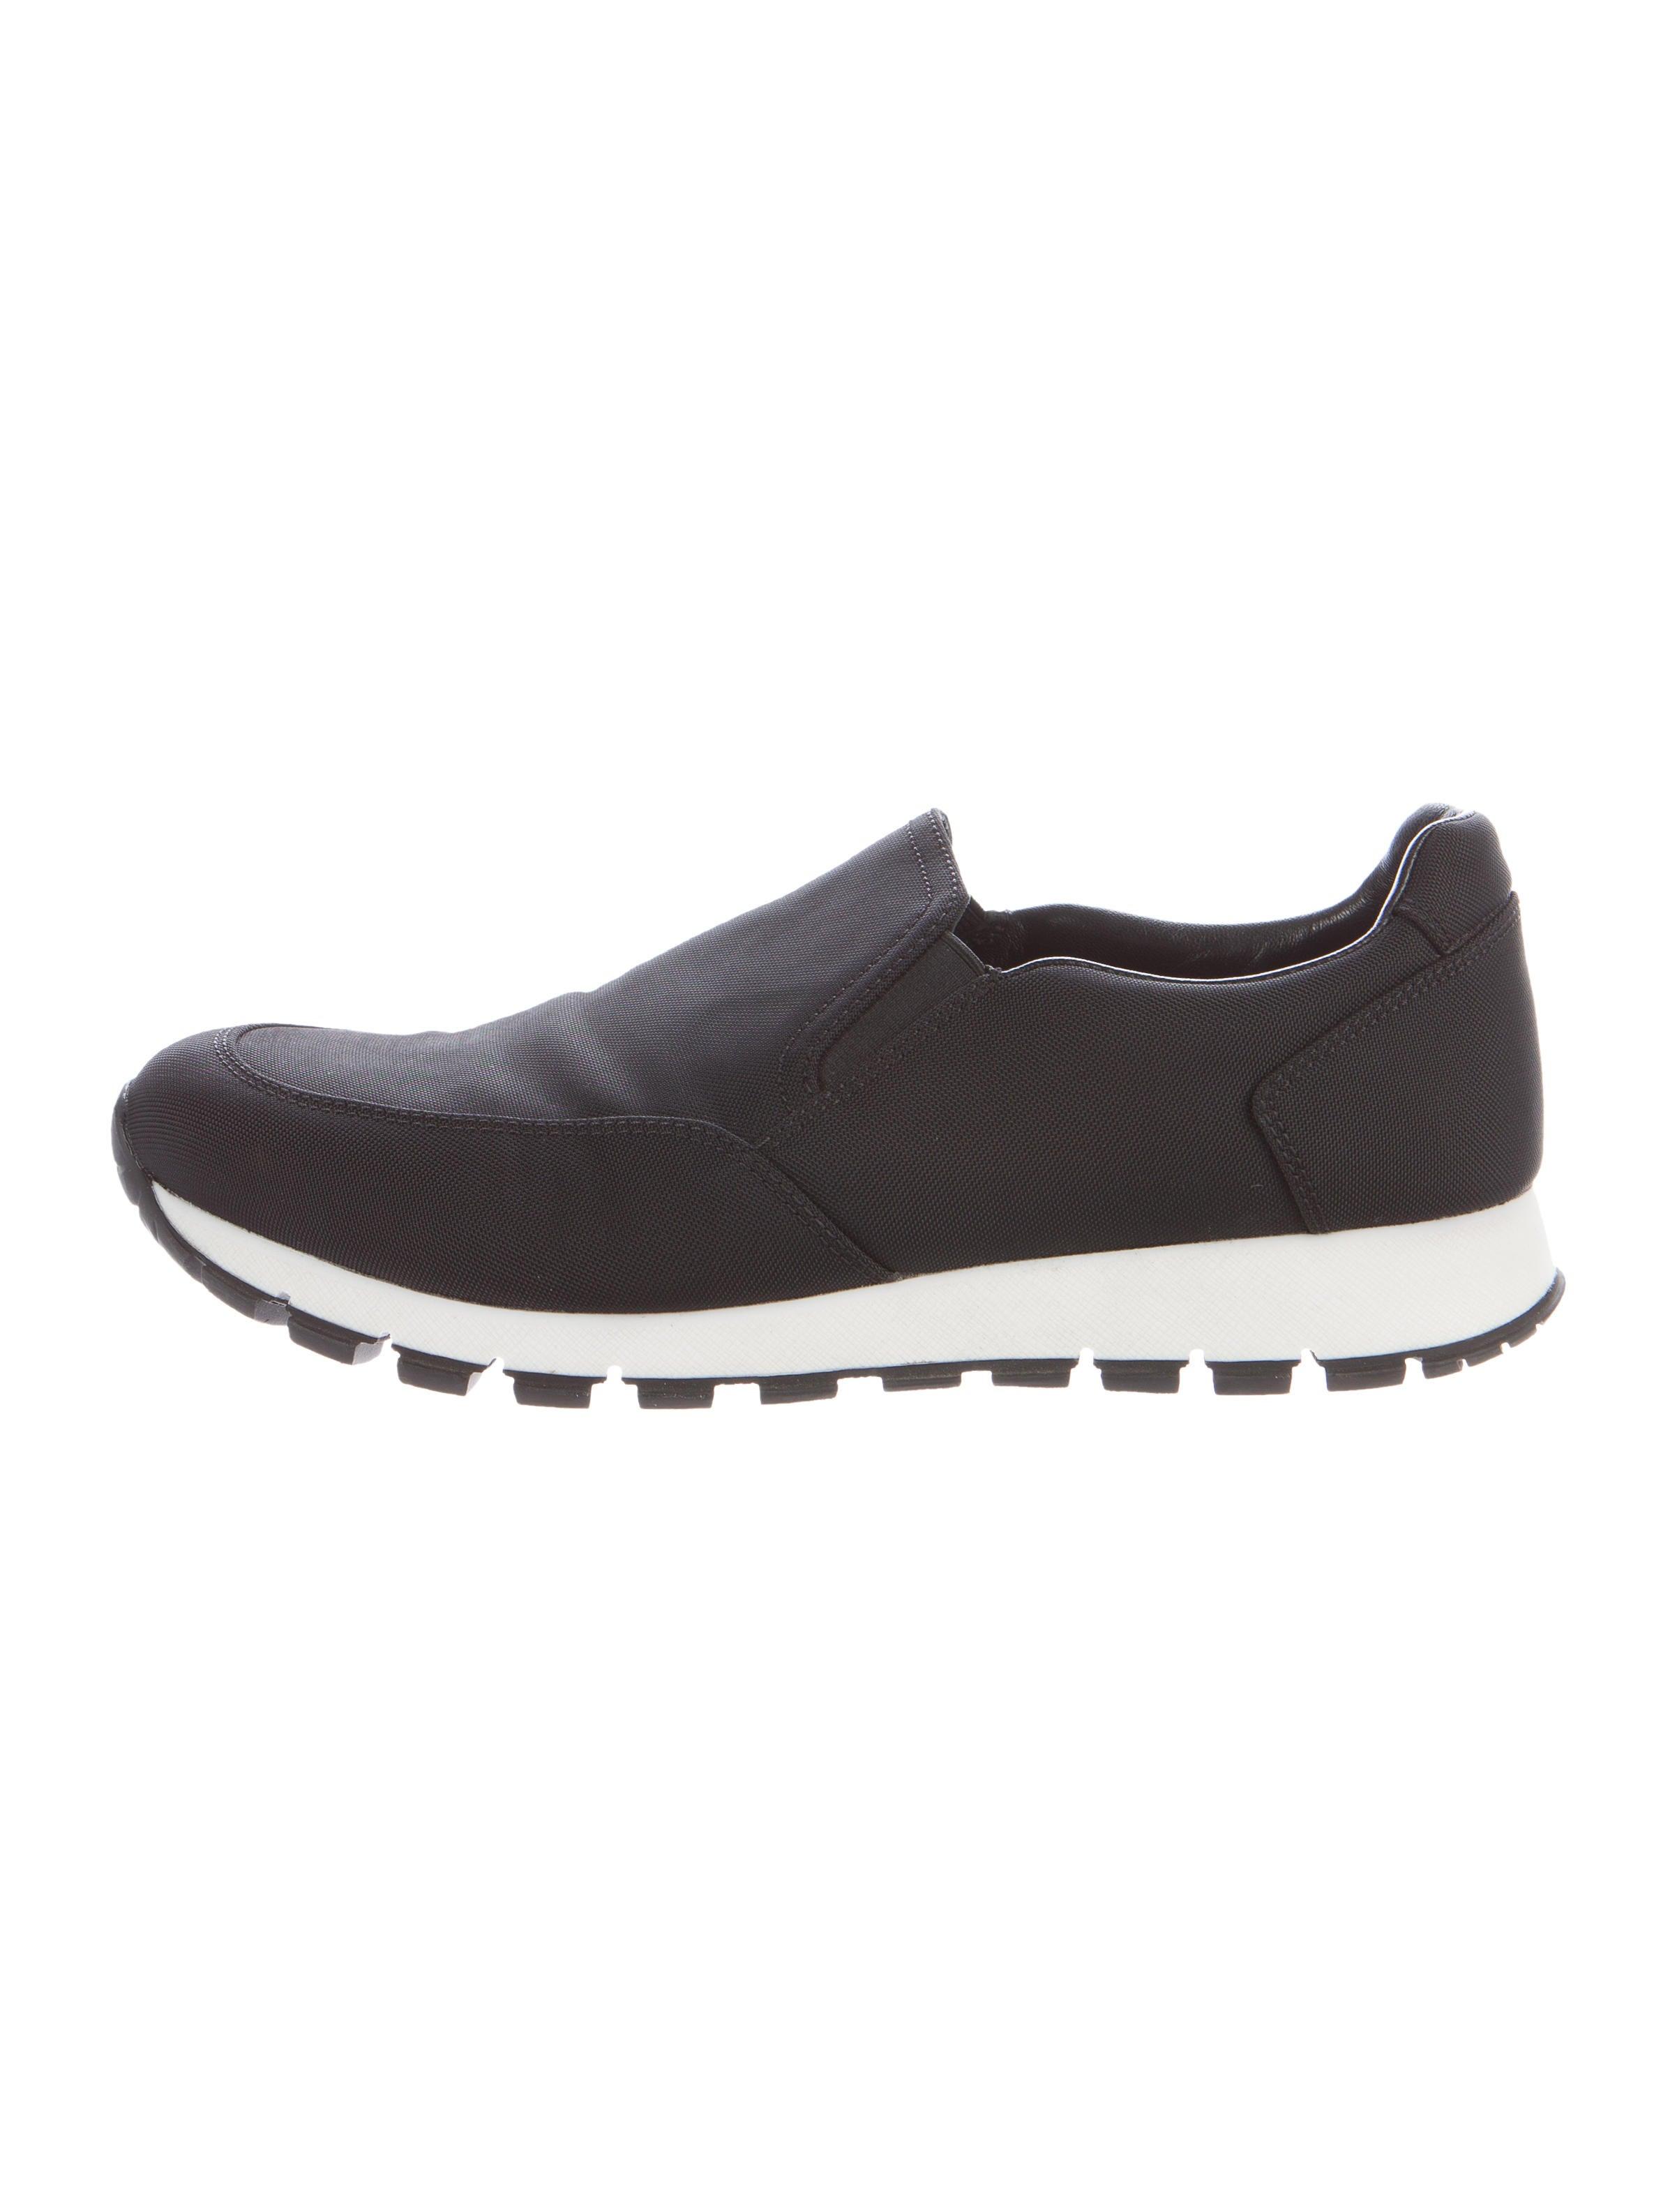 prada sport woven slip on sneakers shoes wpr38959